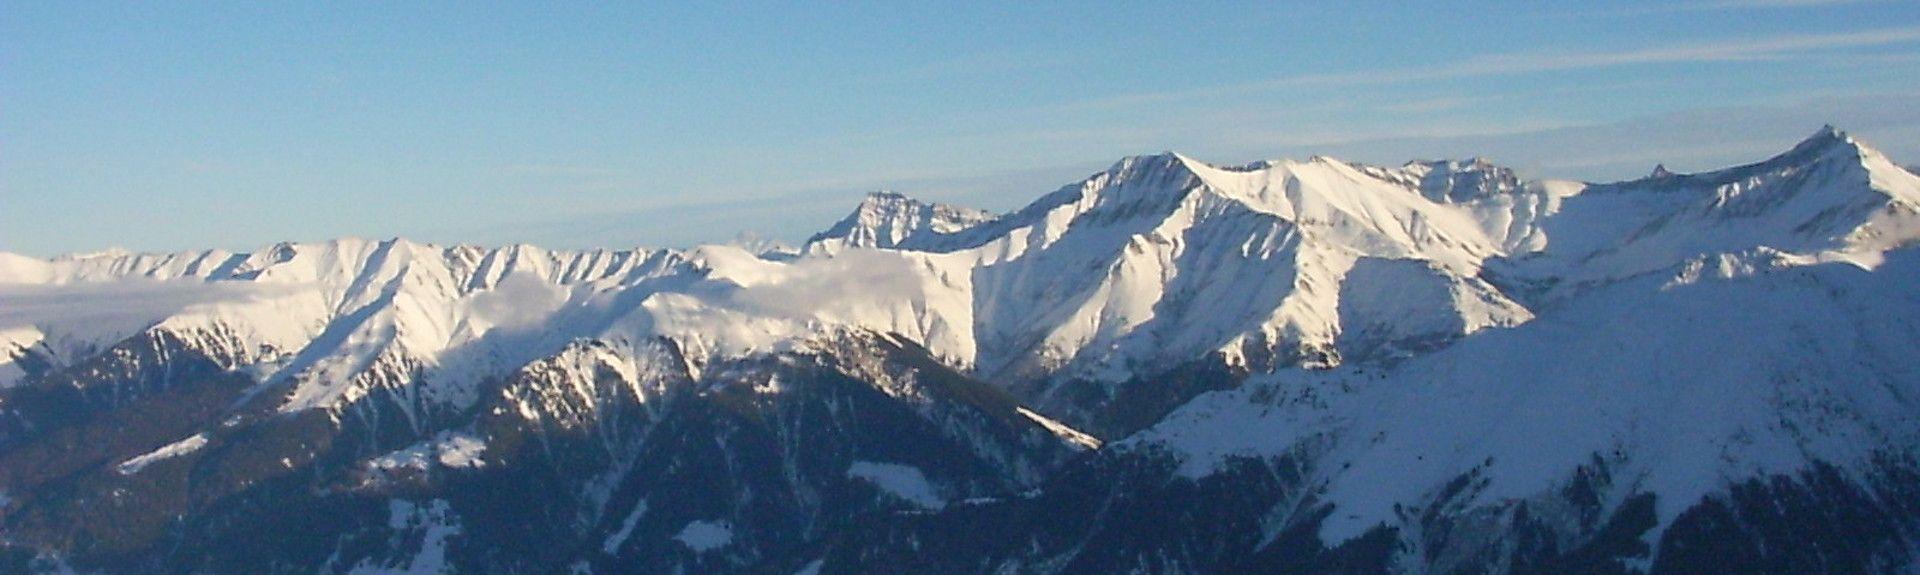 Lumbrein, Lumnezia, Graubuenden, Switzerland